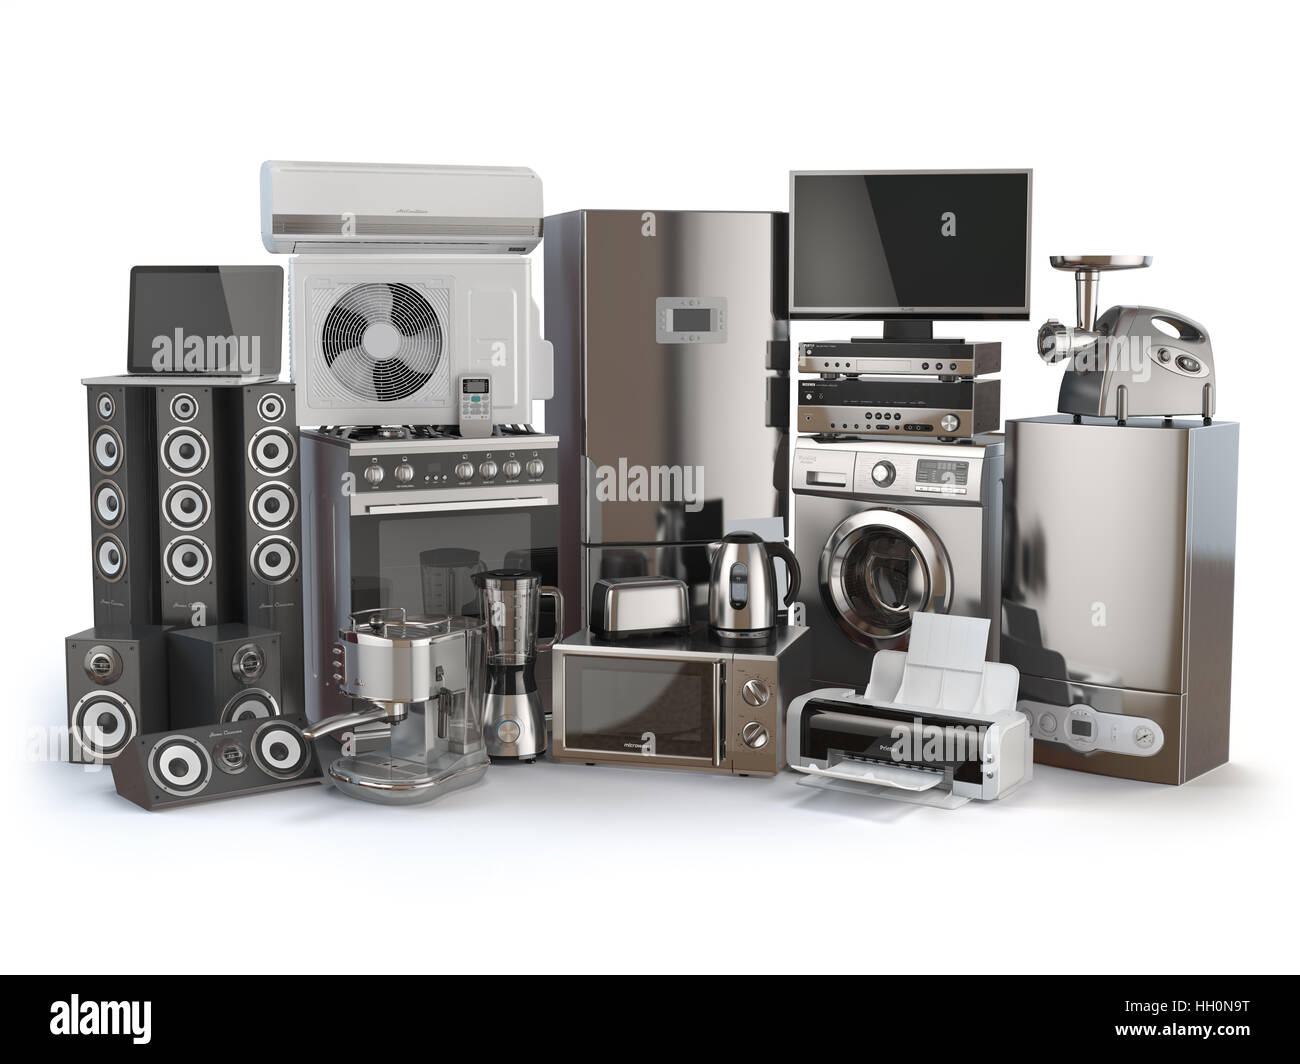 Kühlschrank Gas : Haushaltsgeräte. gas herd tv kino kühlschrank klimaanlage